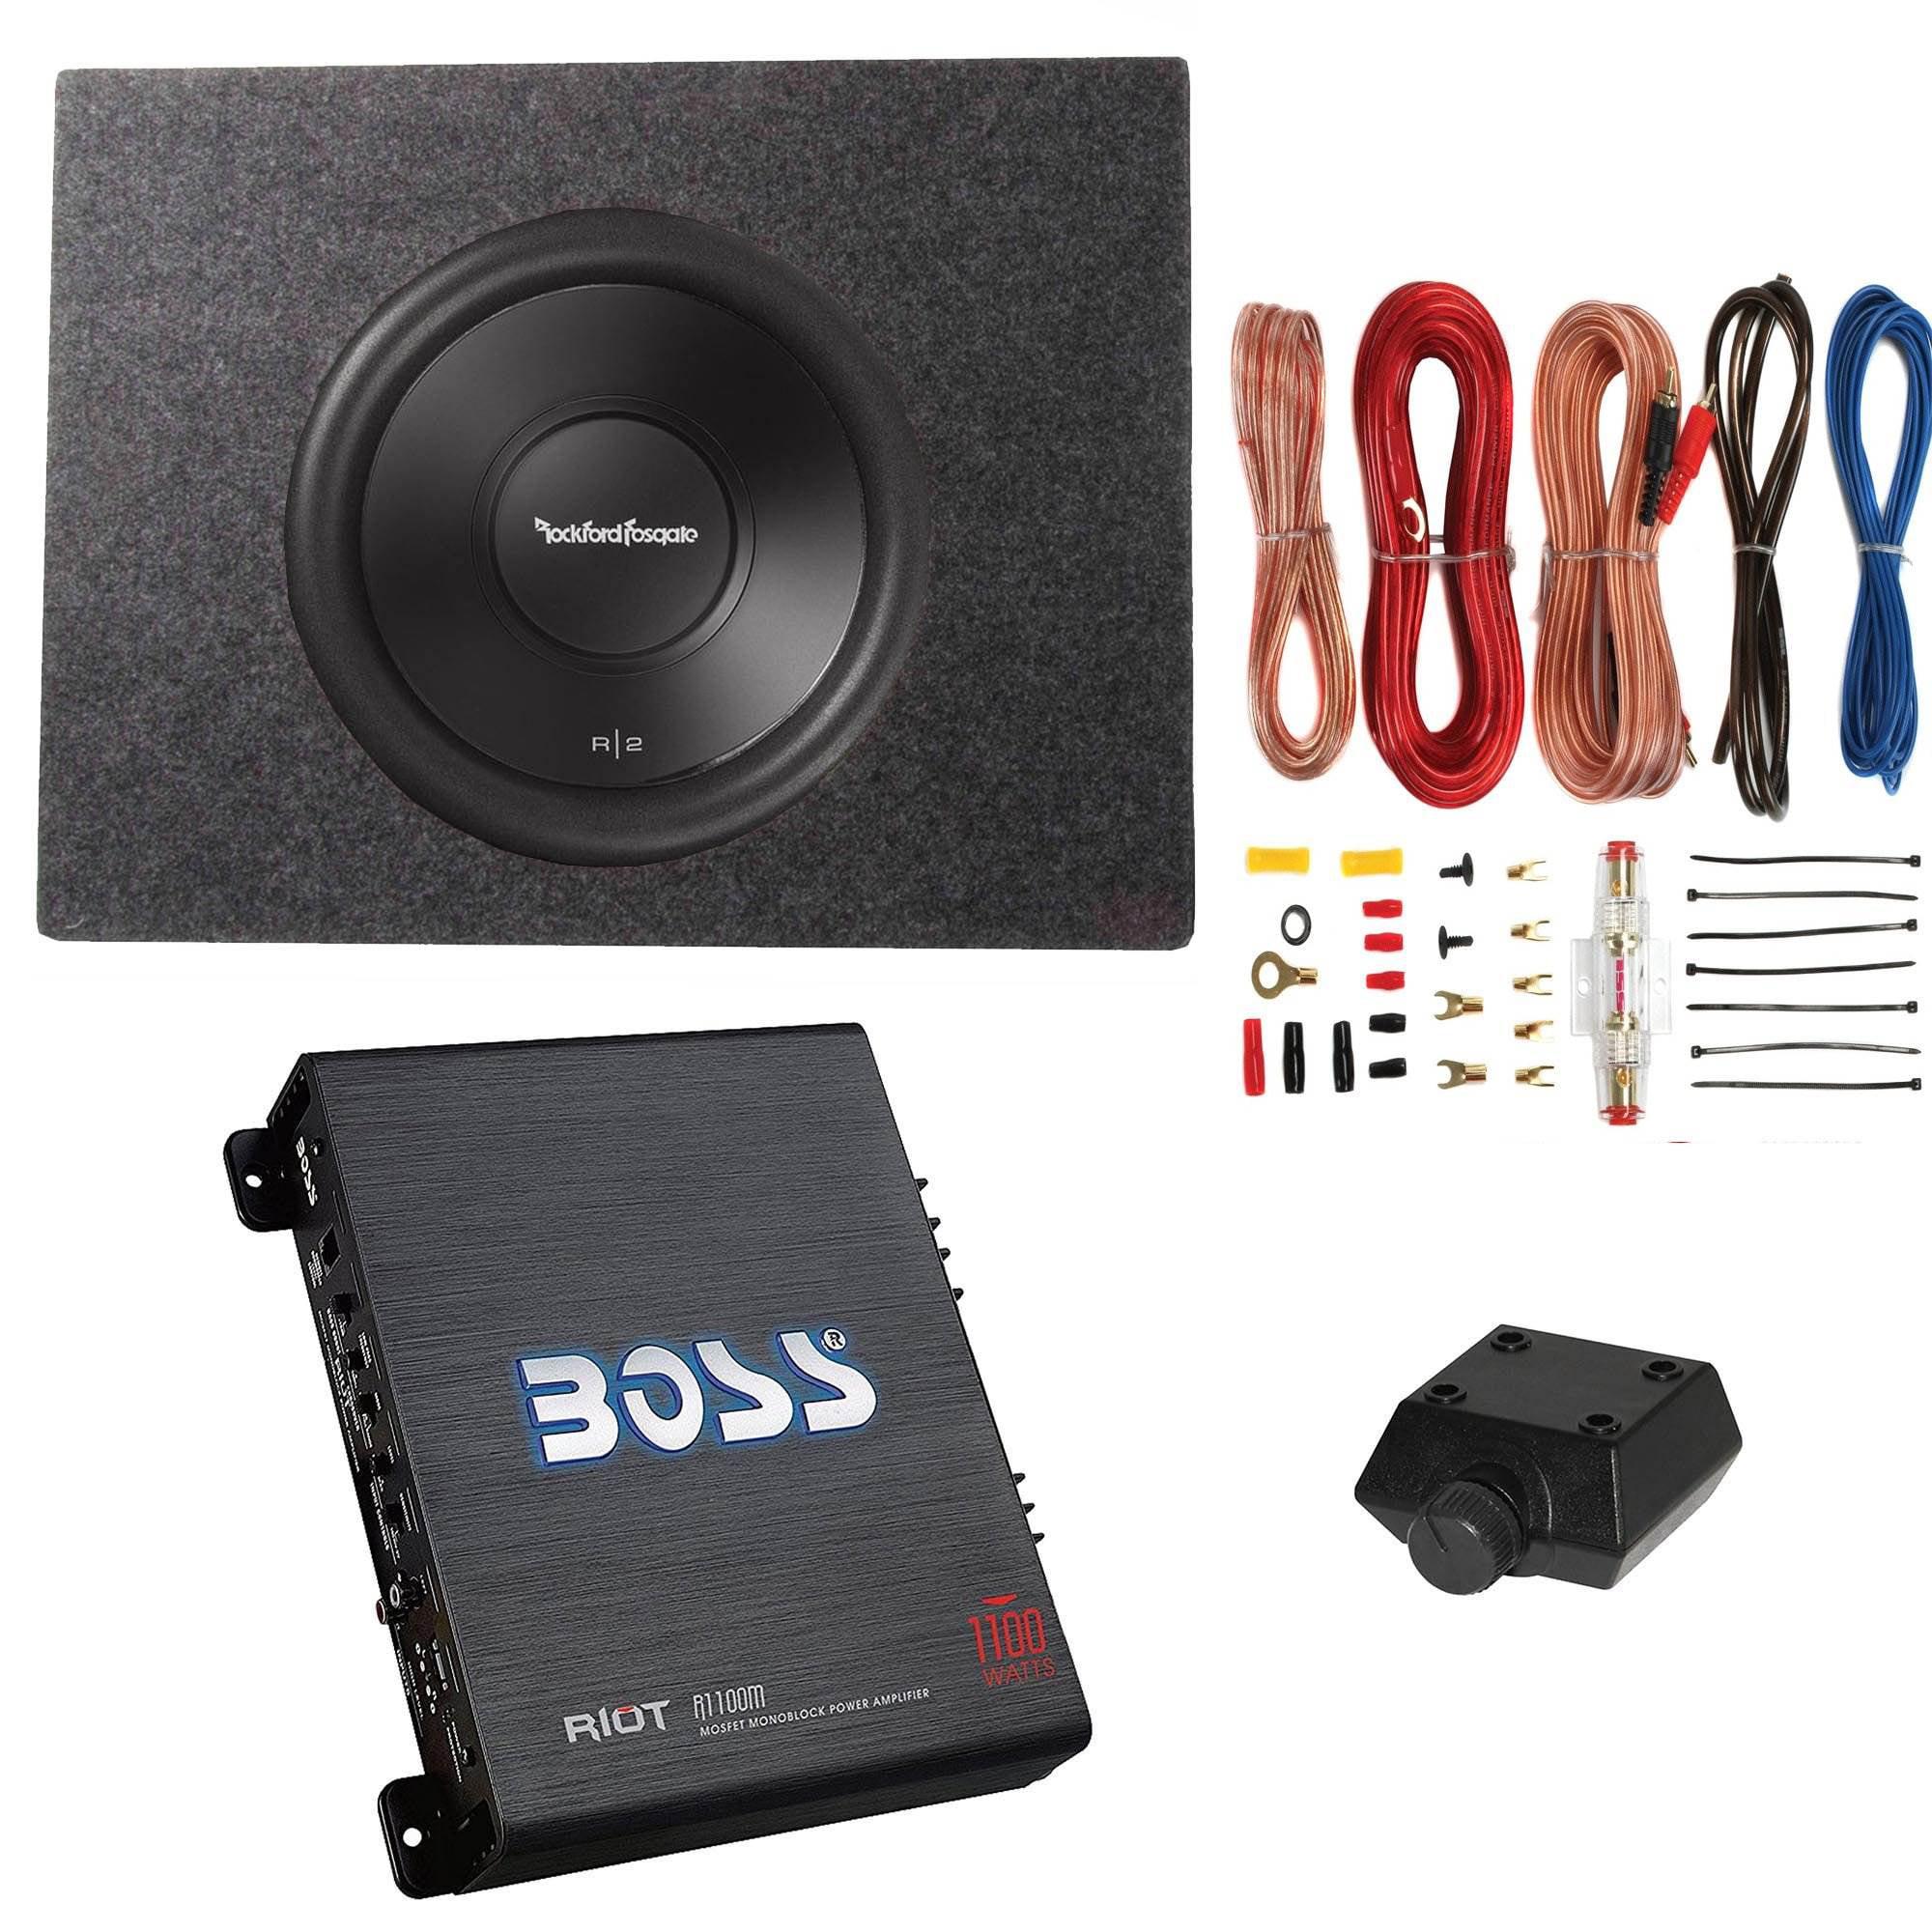 Rockford Fosgate 10 500w Complete Subwoofer Package With Amplifier Amp Kit Walmart Com Walmart Com